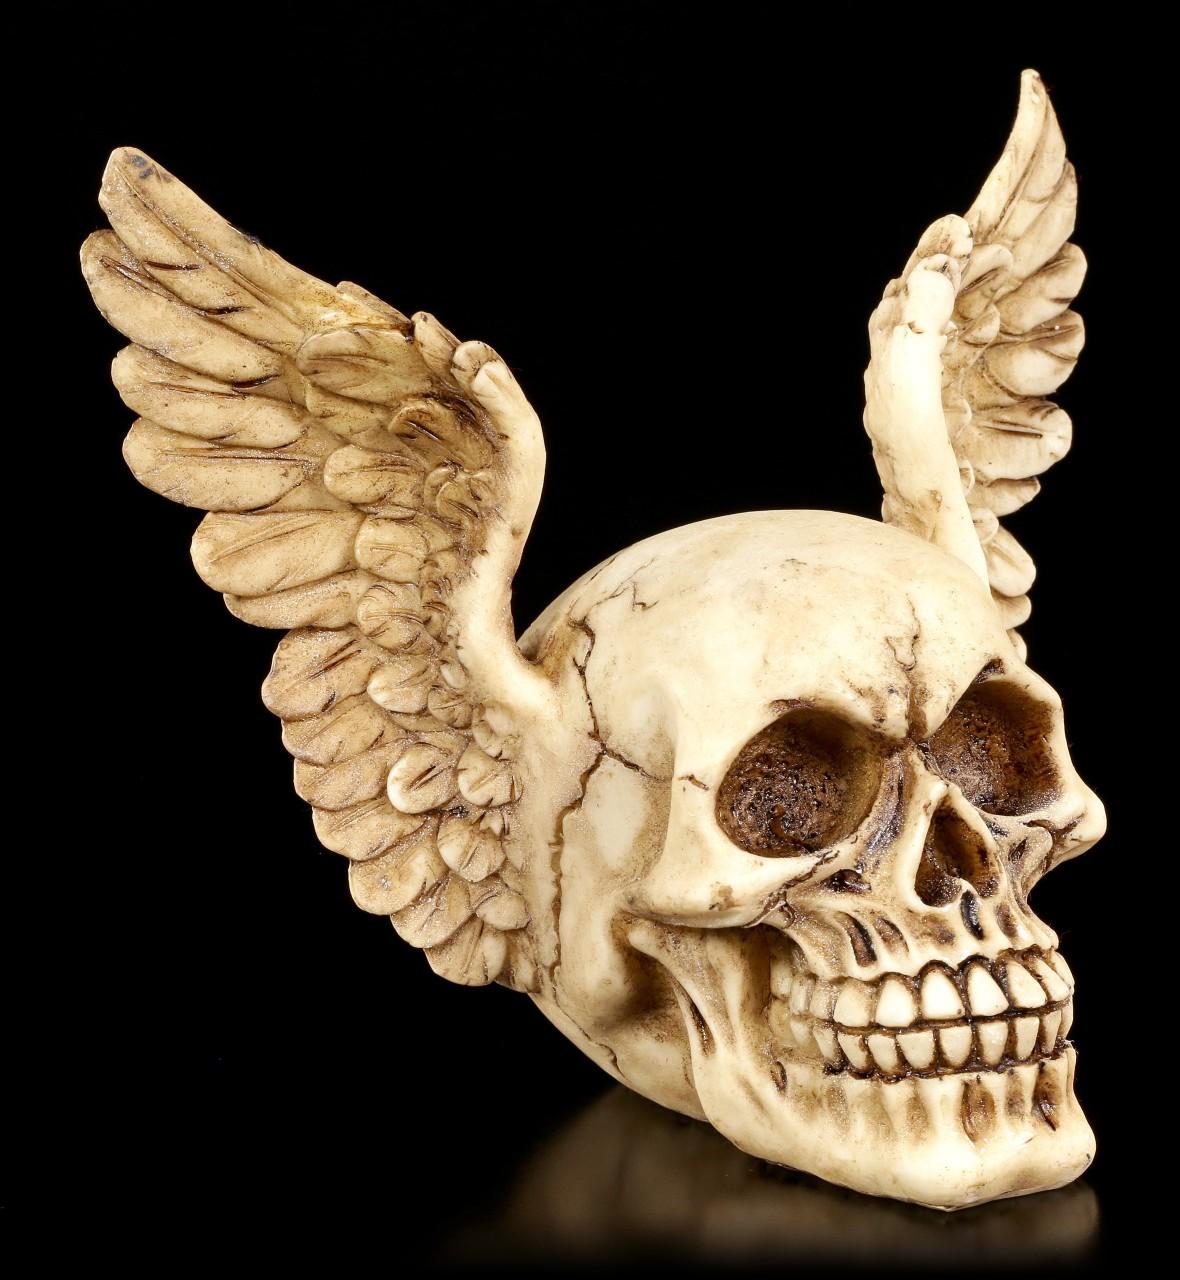 Totenkopf mit Flügeln - Wings of Heaven